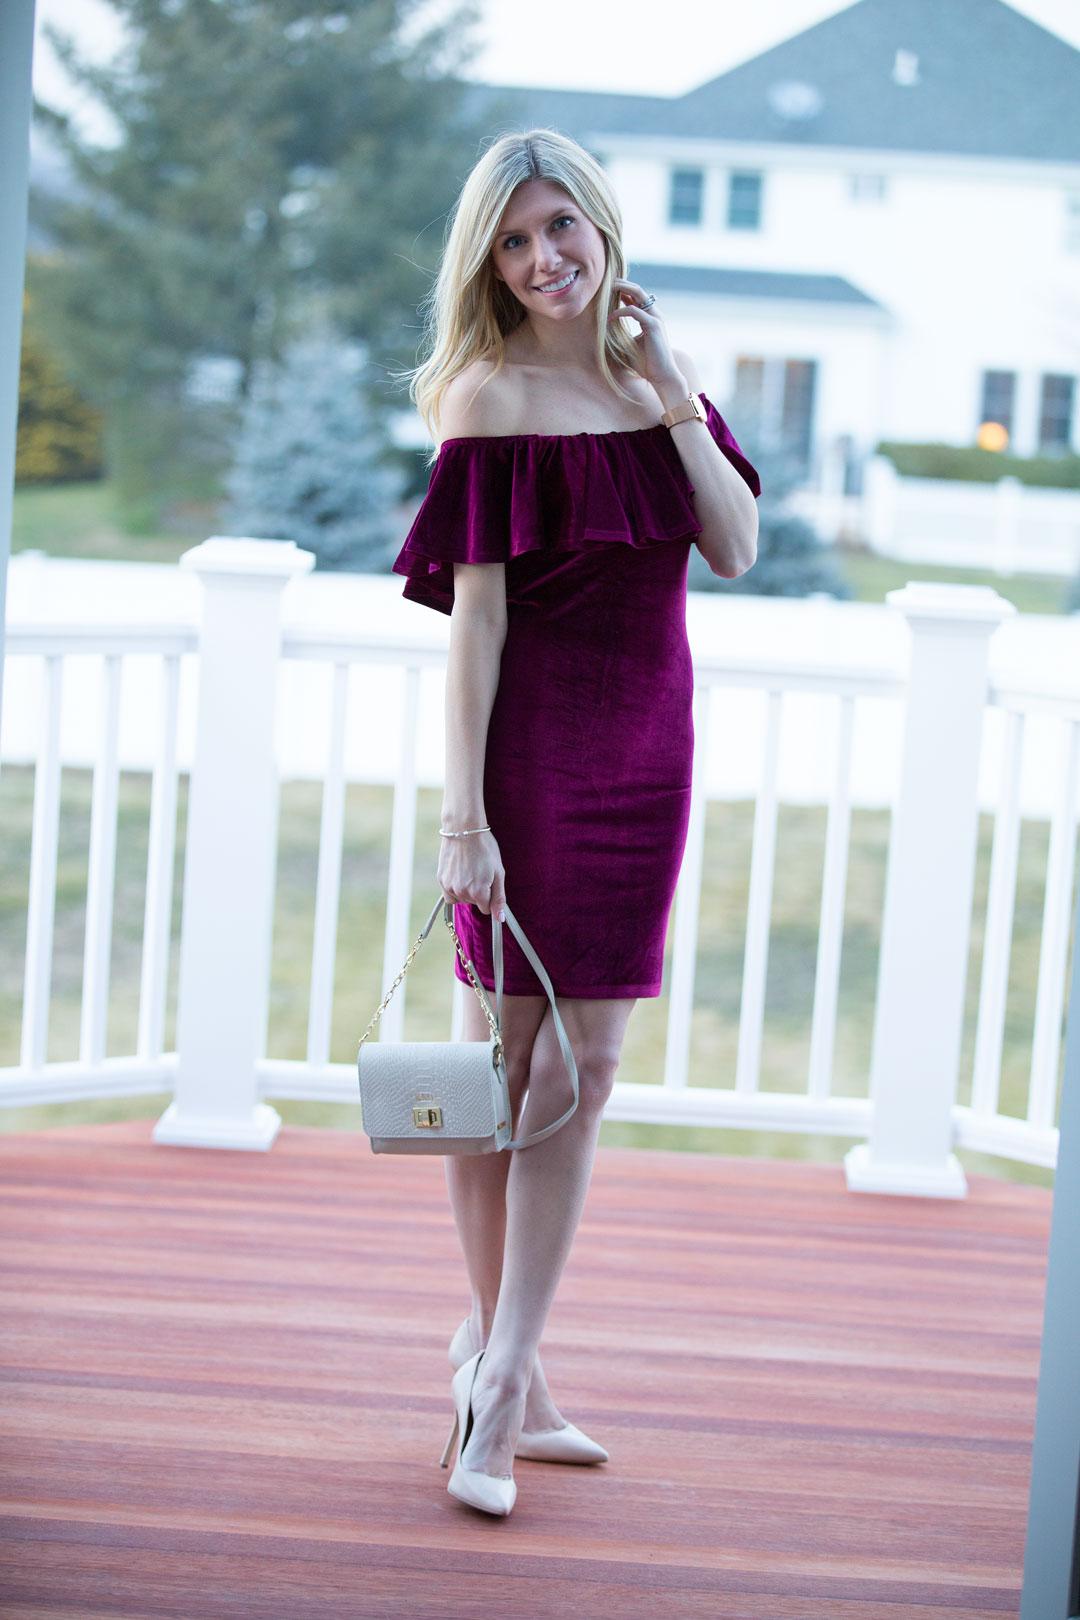 Burgundry Ruffle Dress from Shein under $20